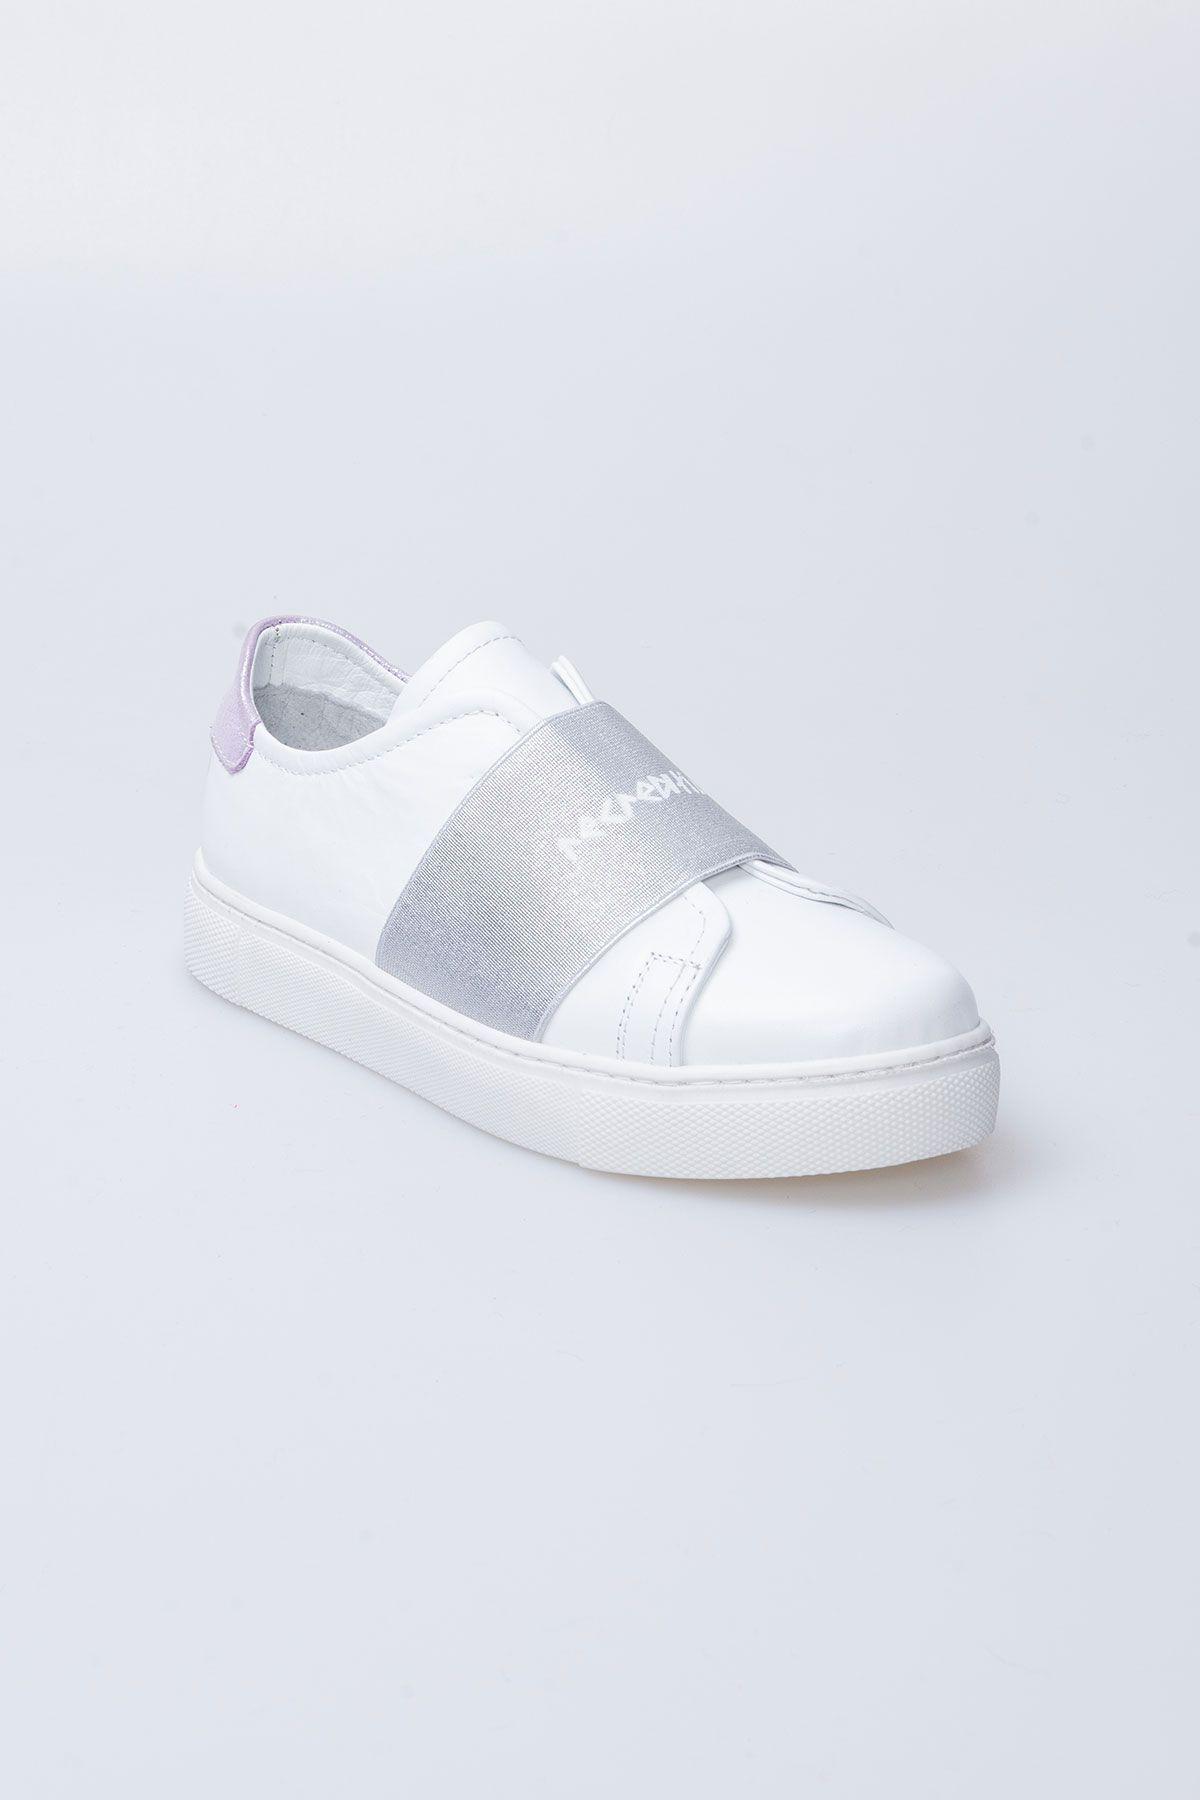 Pegia Recreation Hakiki Deri Bayan Sneaker 19REC101 Gümüş